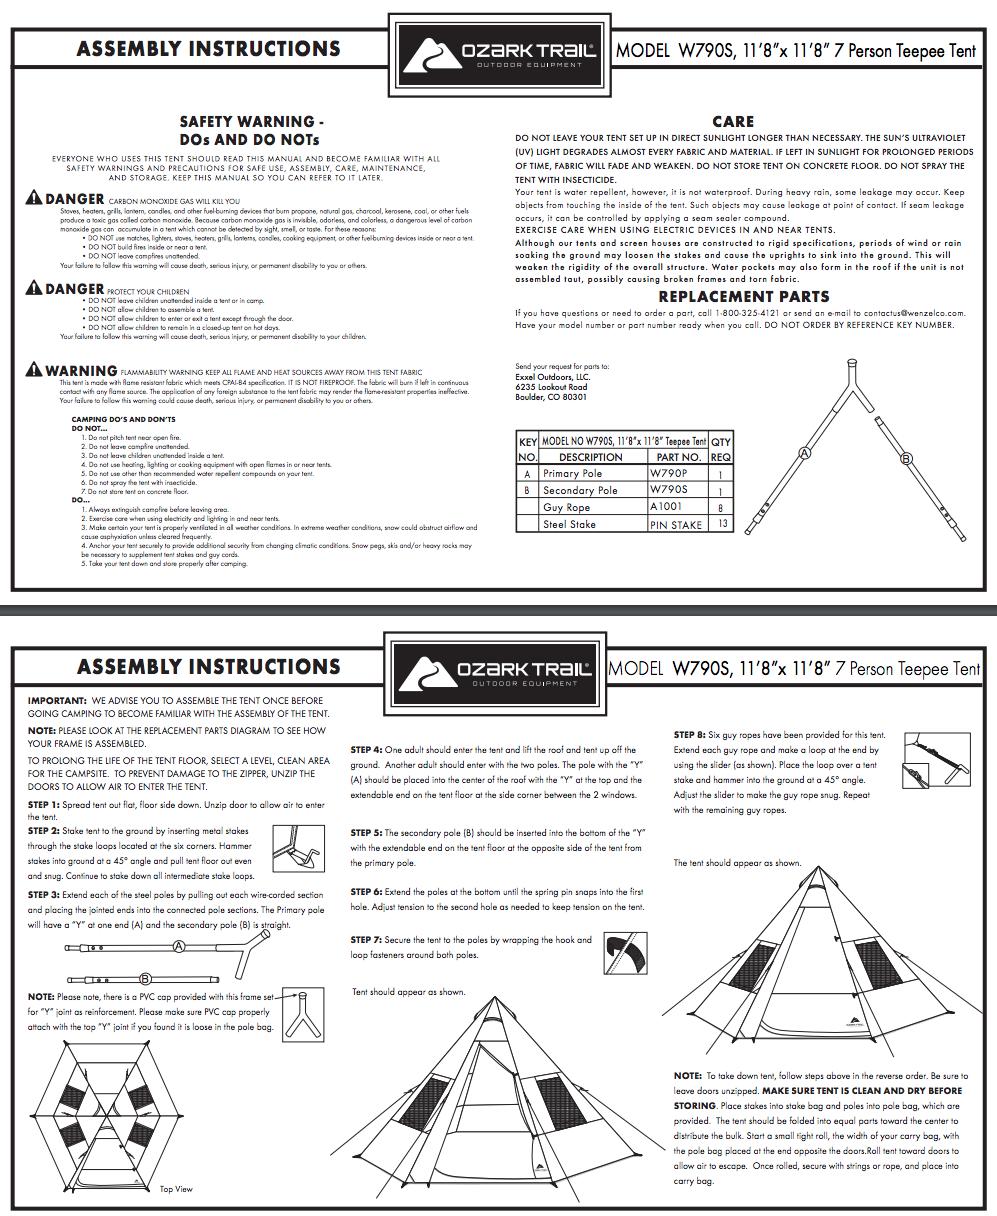 2 room canvas tent instructions